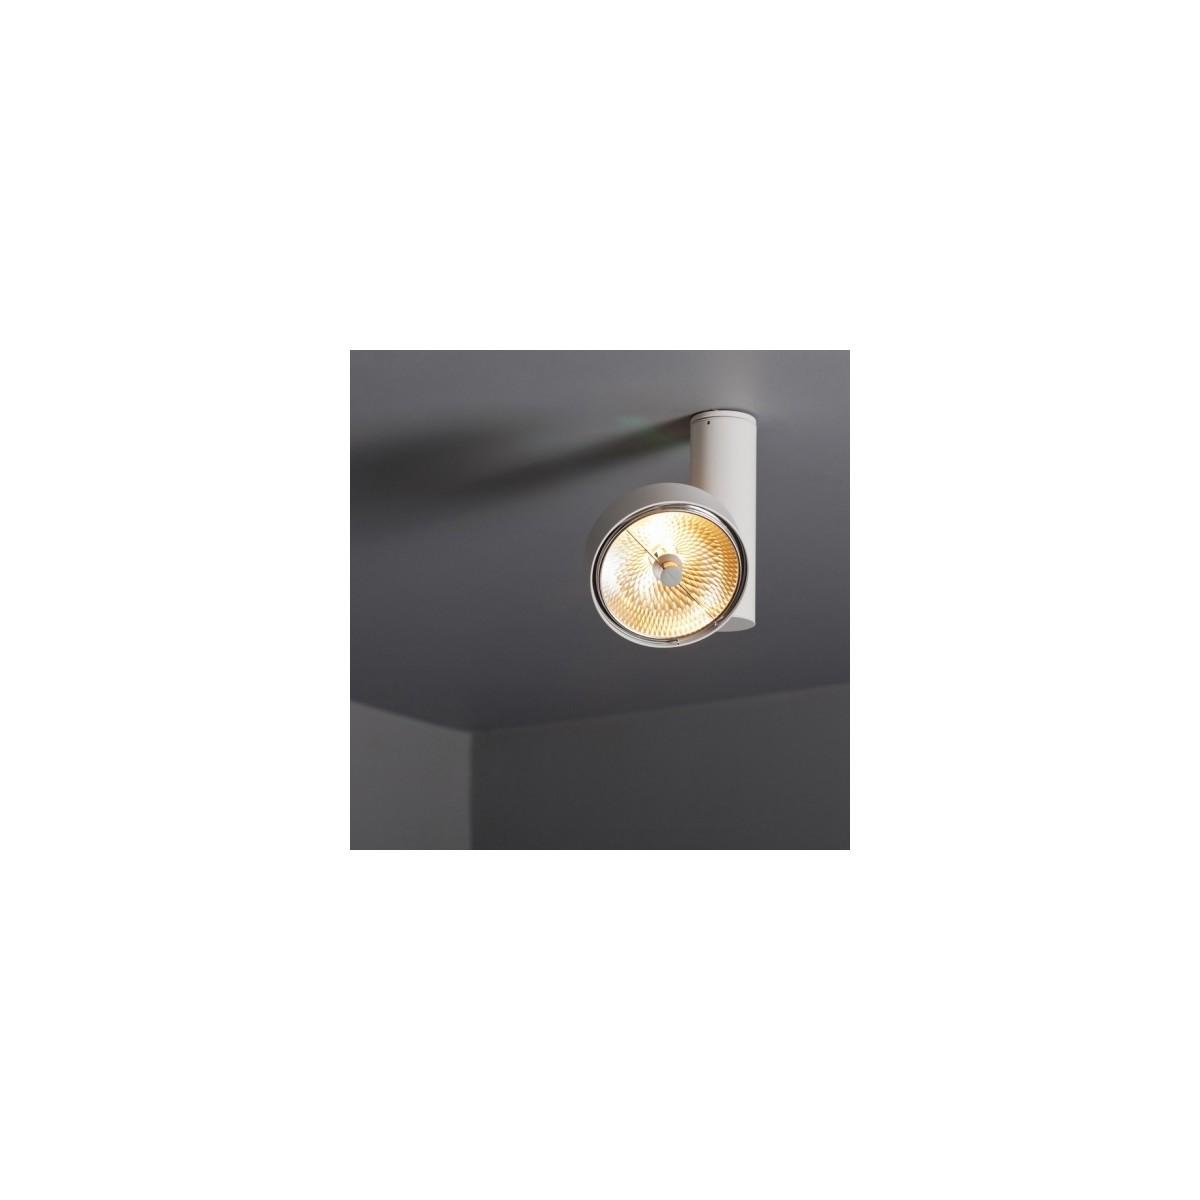 Labra ROBOTIC R1 2-0123 Reflektor